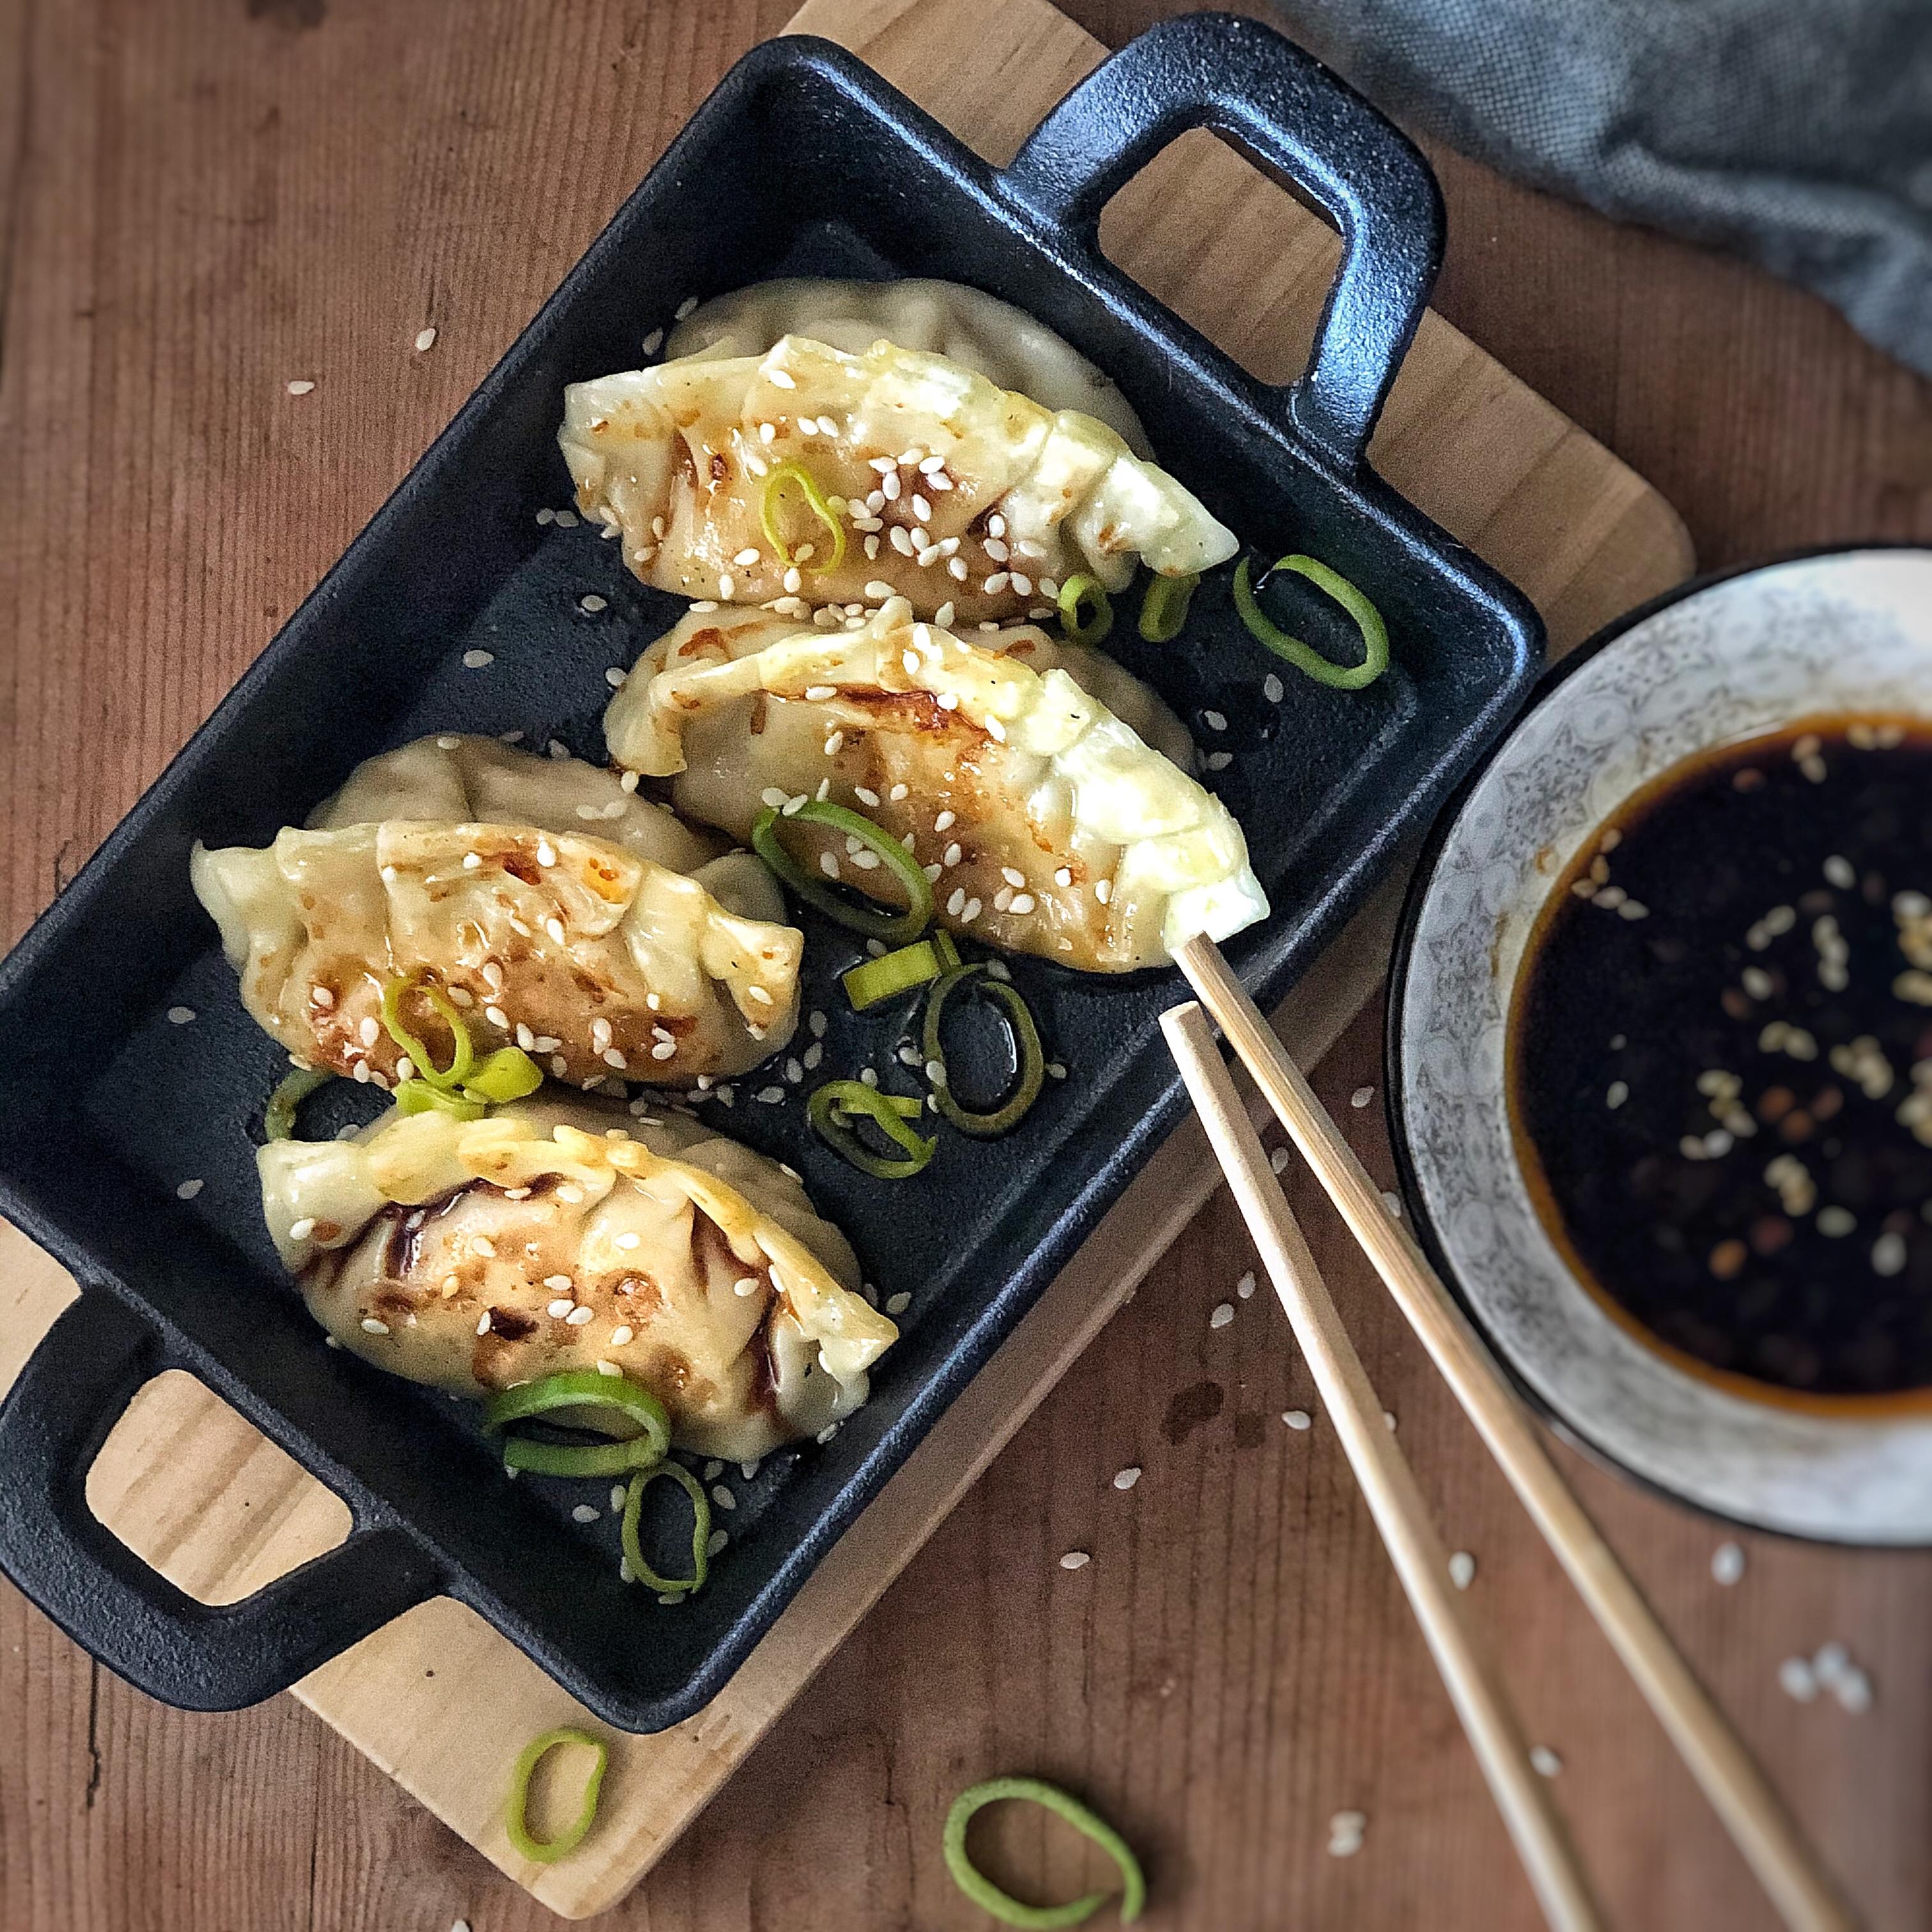 Ravioli alla piastra : Jiaozi la mia ricetta vegetariana